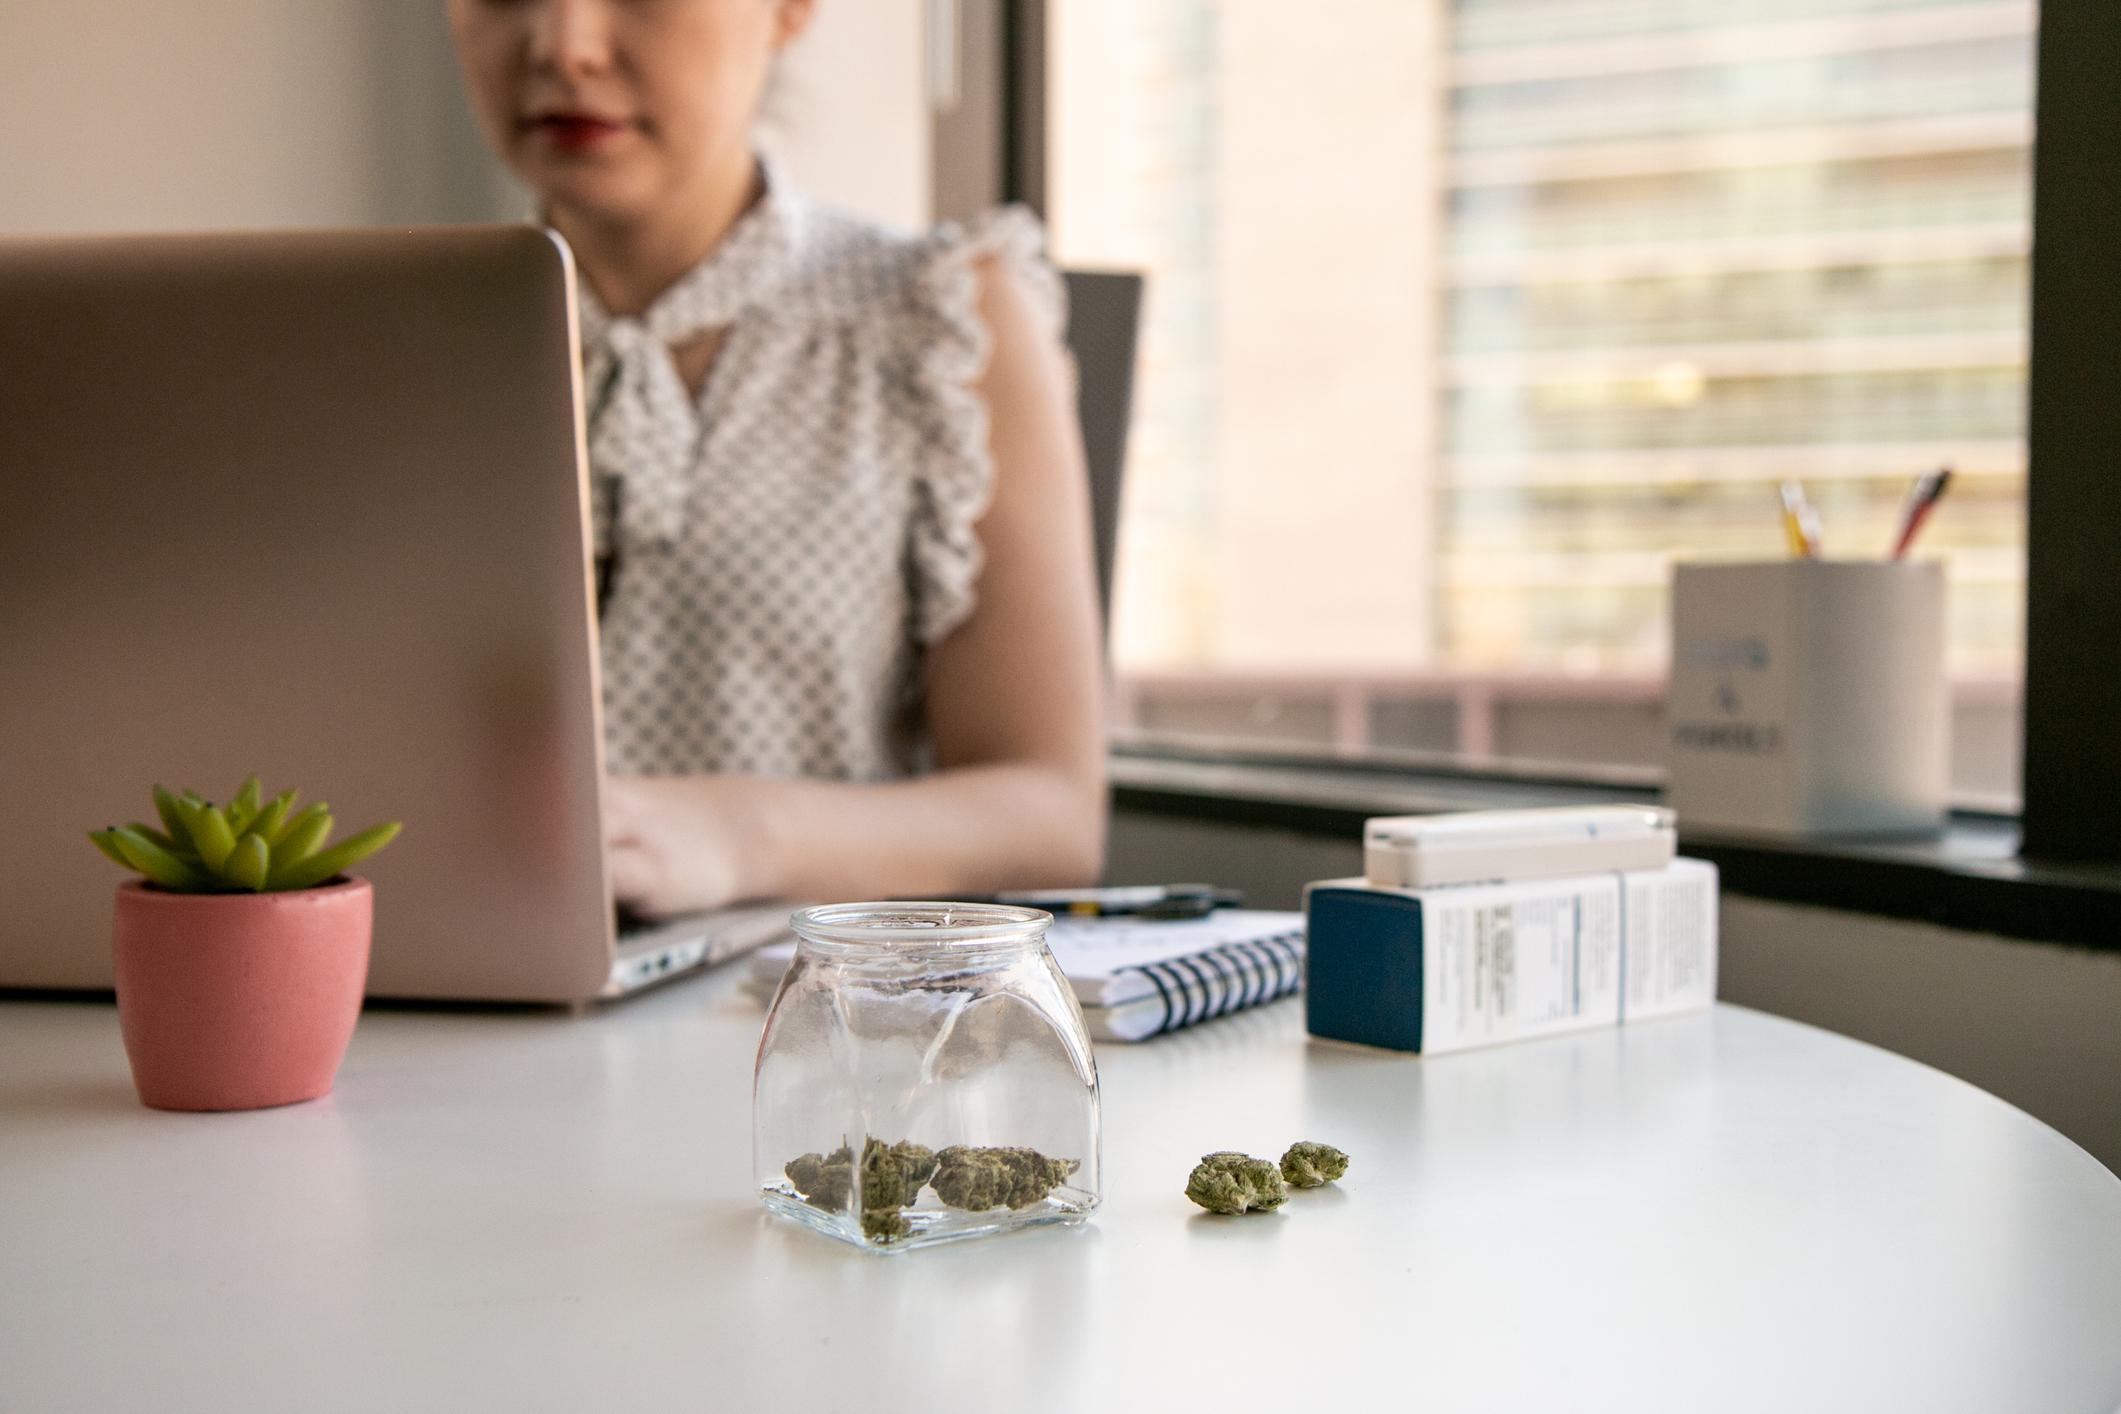 Female-Cannabis-Entrepreneur-working-on-Marketing-for-Marijuana-Business-in-Bright,-Soft-Lit-Office-1129397827_2125x1417.jpeg